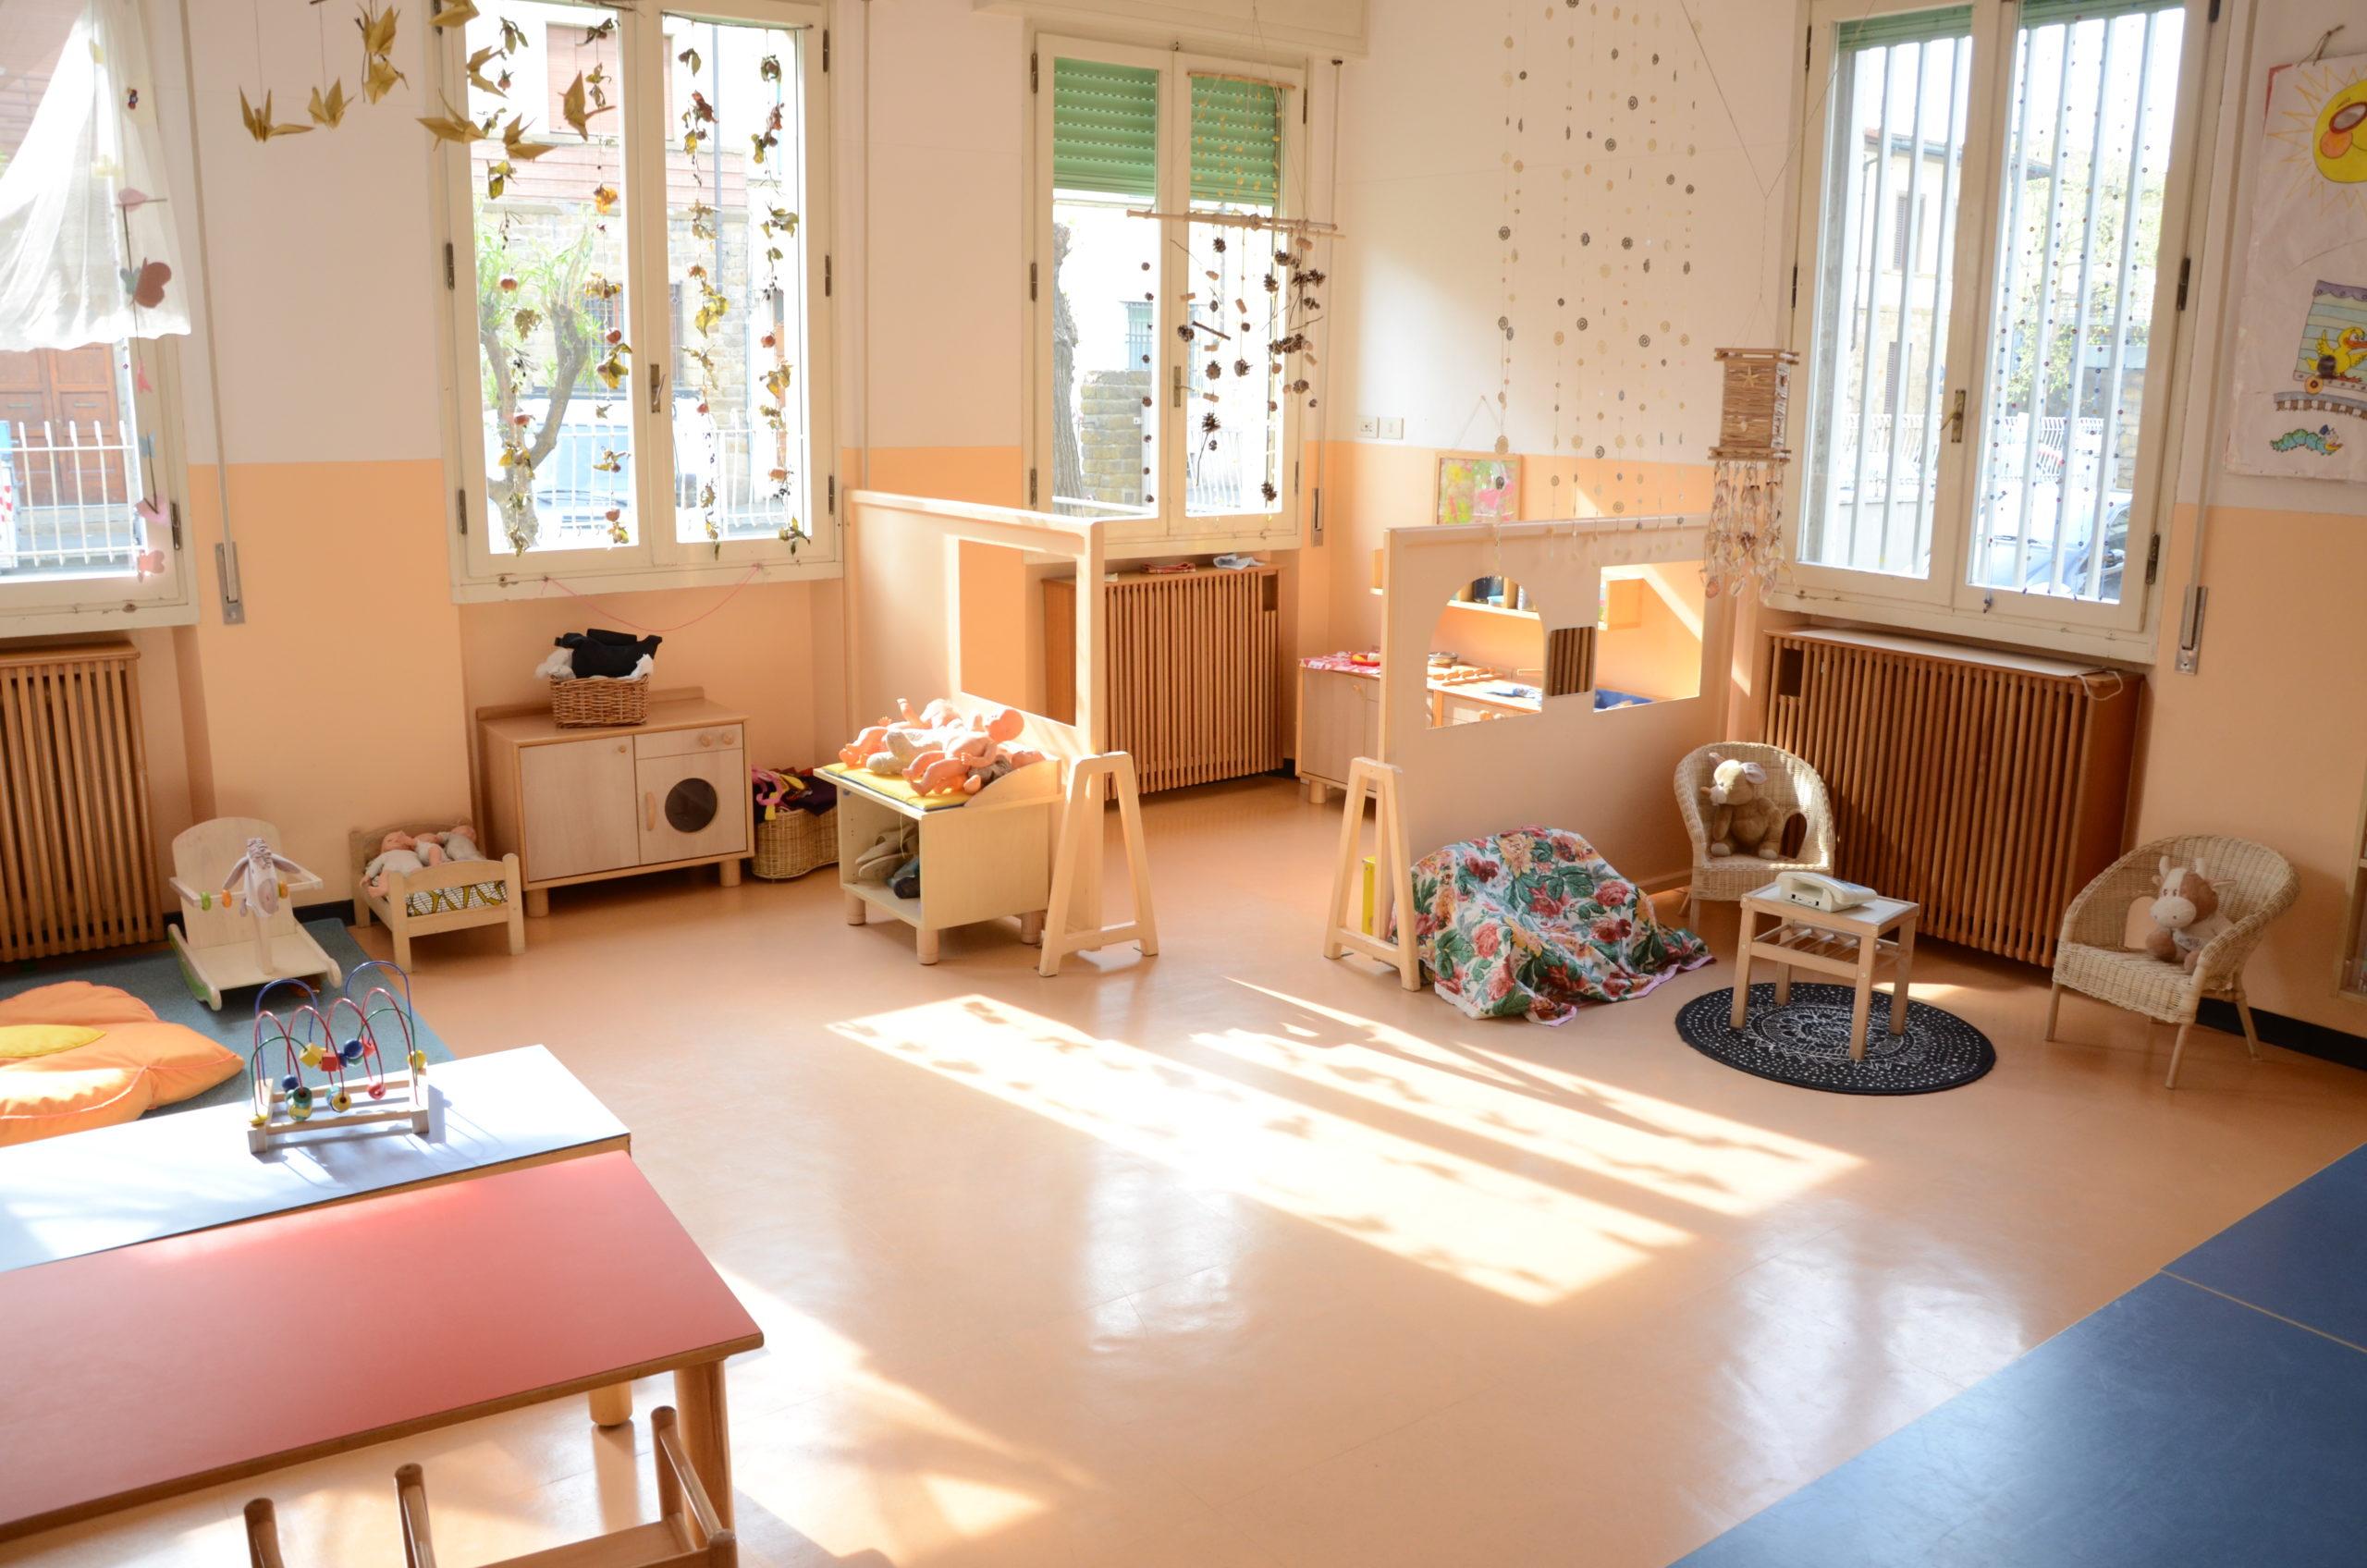 Nido d'infanzia Primi Passi - Istituto San Gregorio